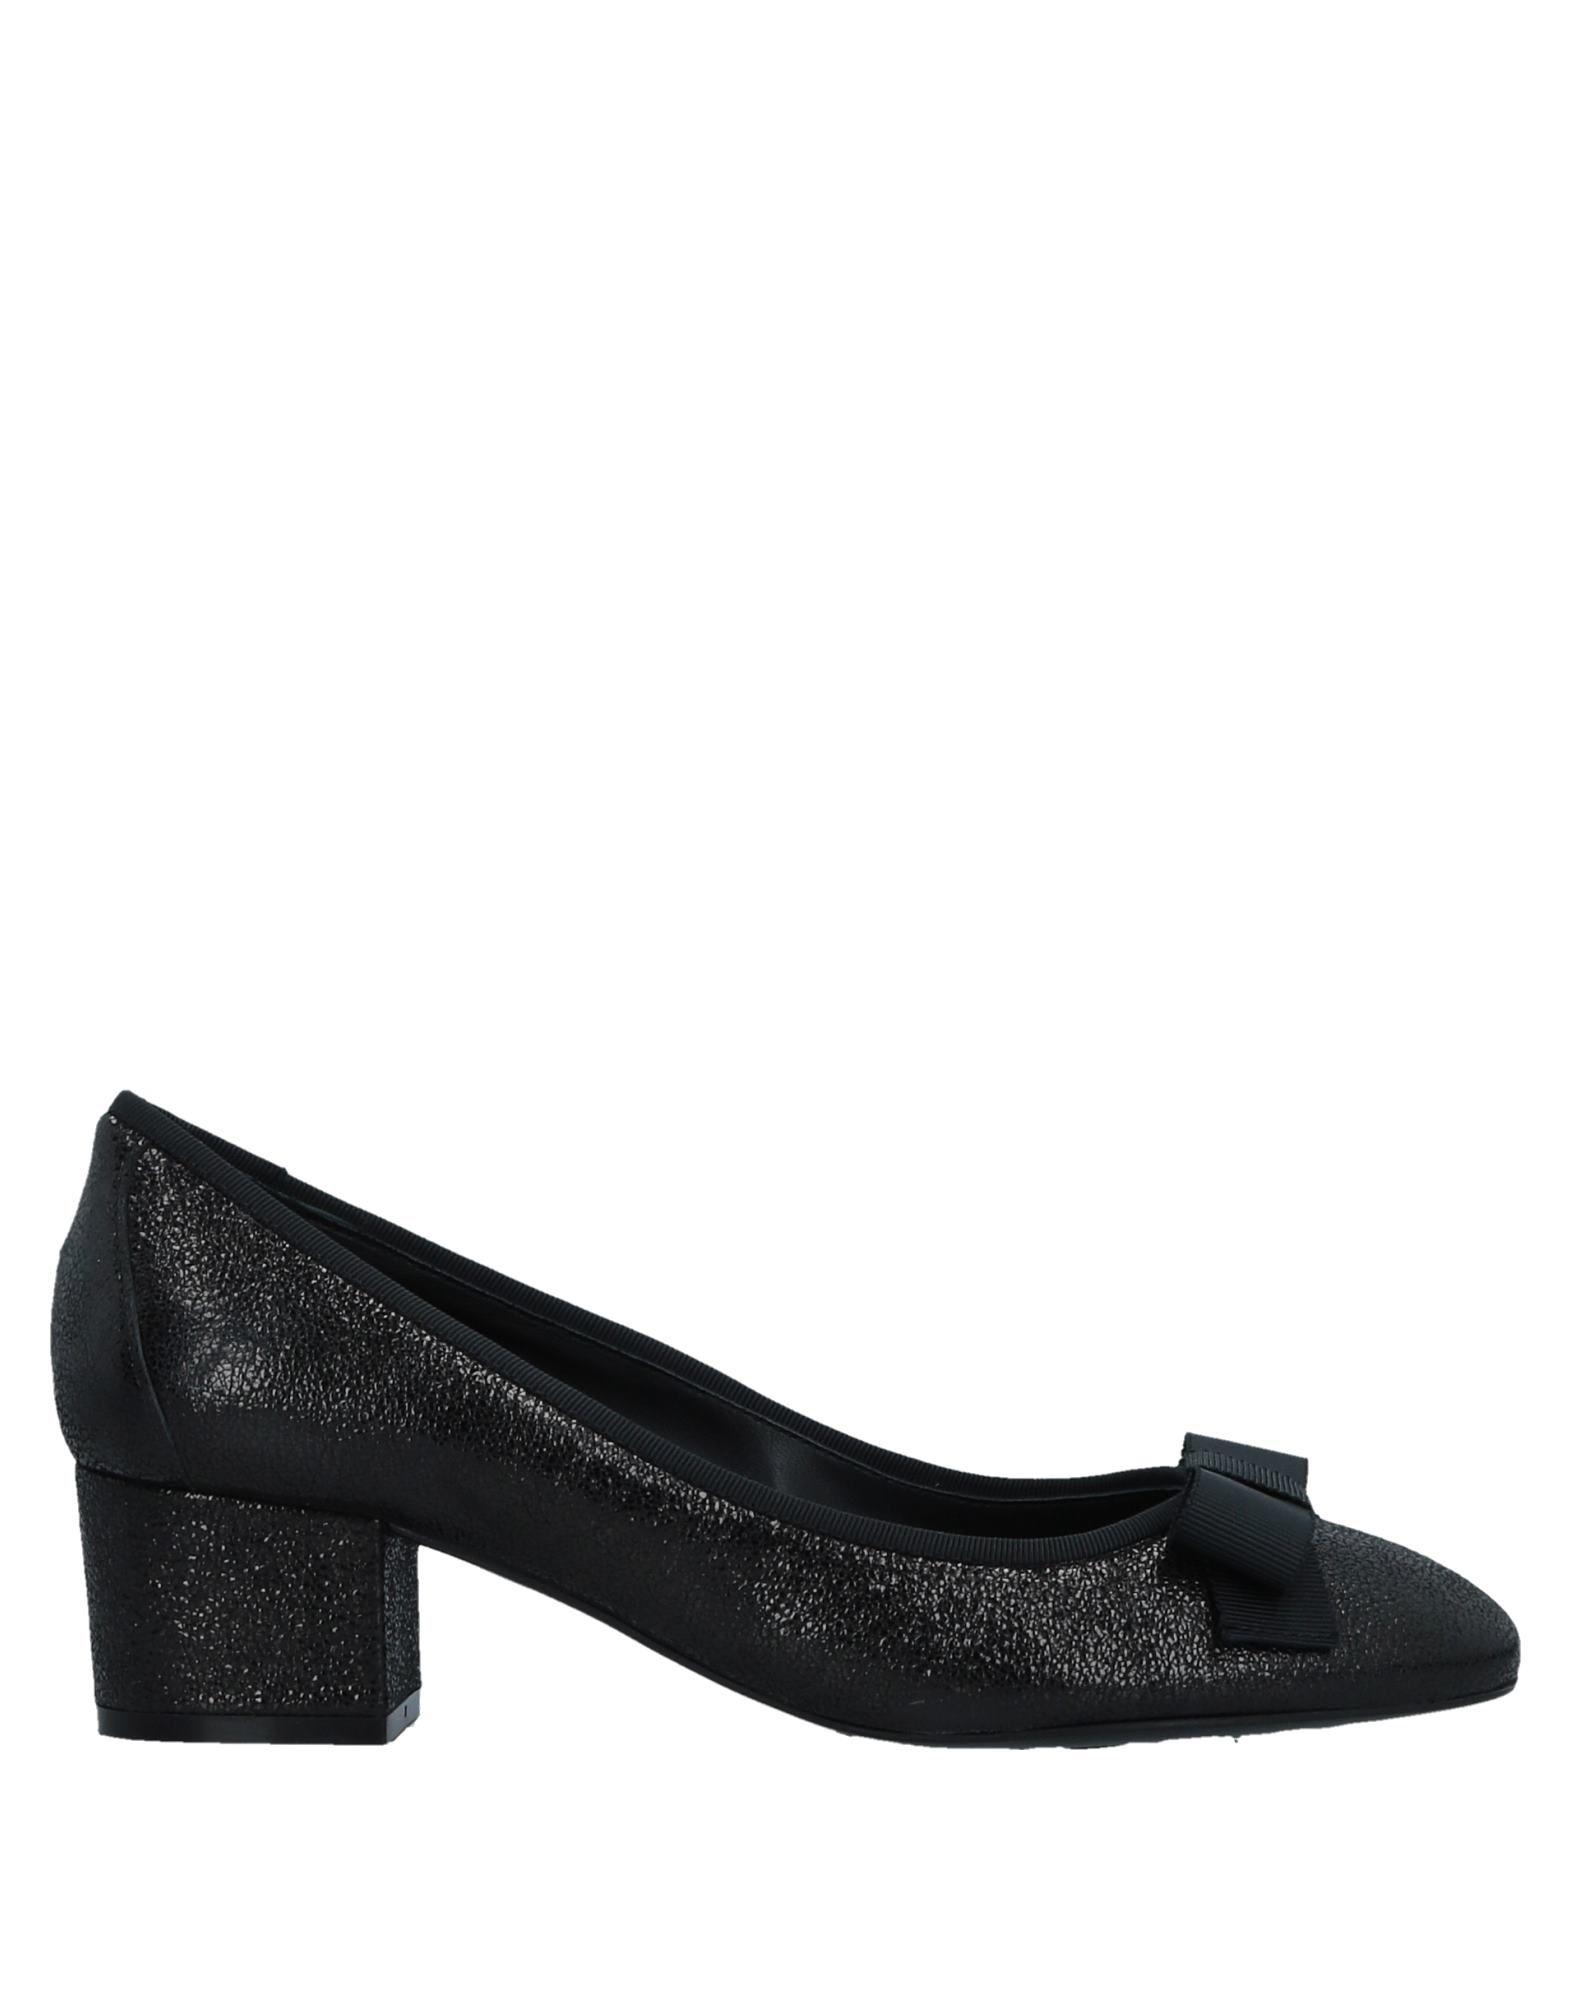 Festa Milano Pumps Damen  11523017QP Gute Qualität beliebte Schuhe